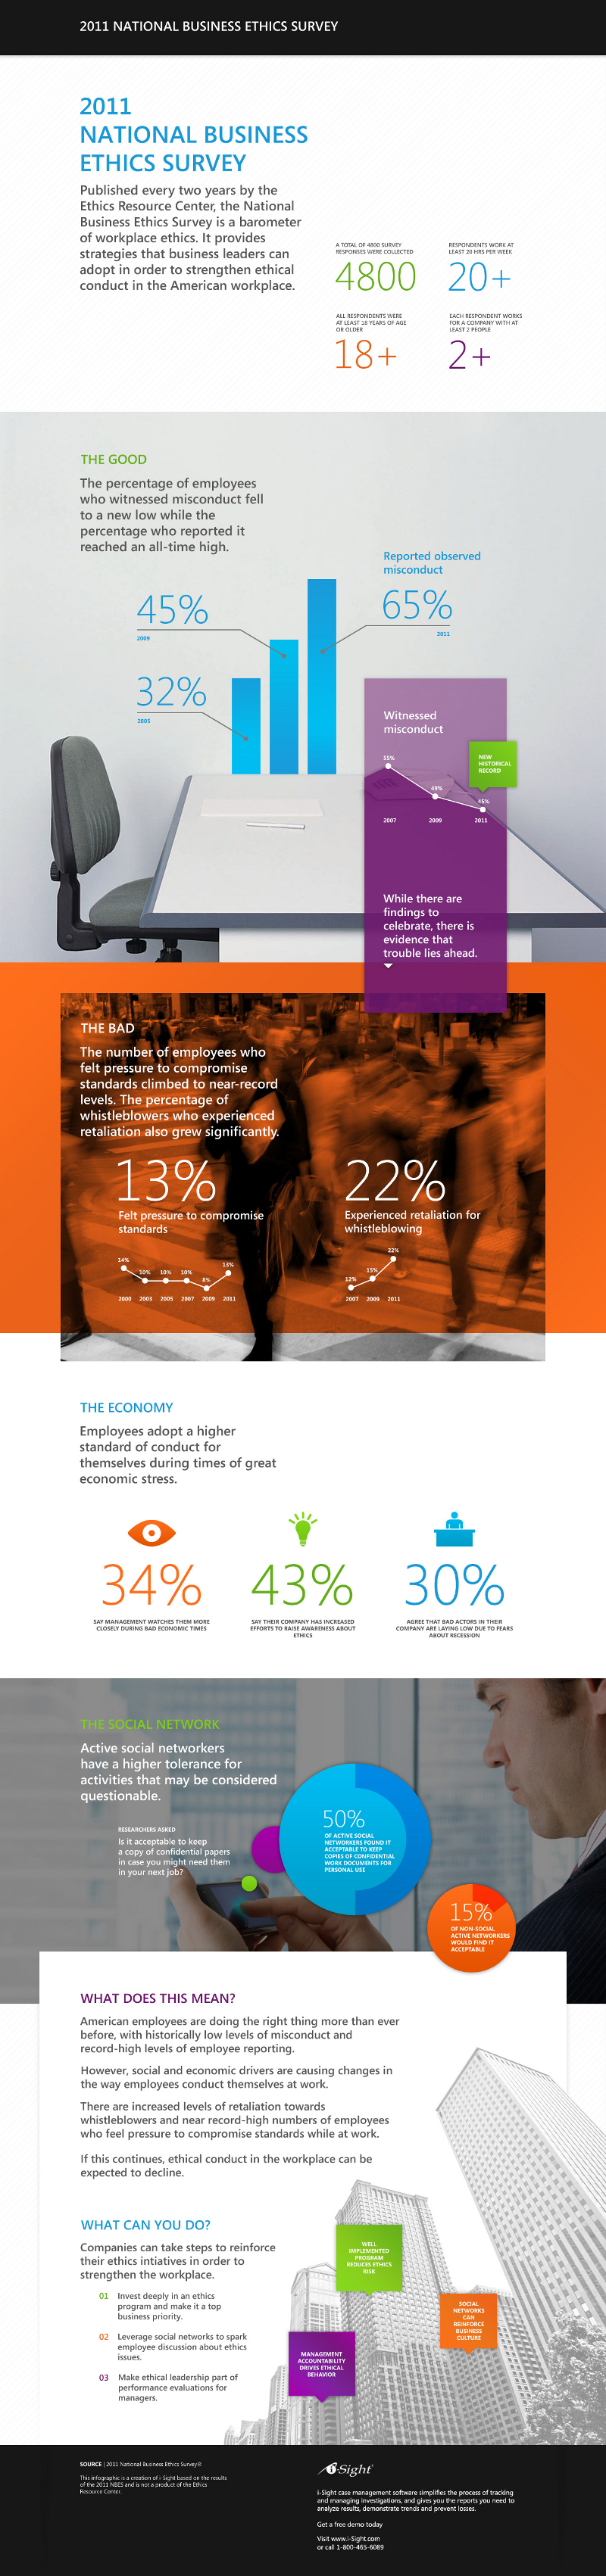 National-Business-Ethics-Survey